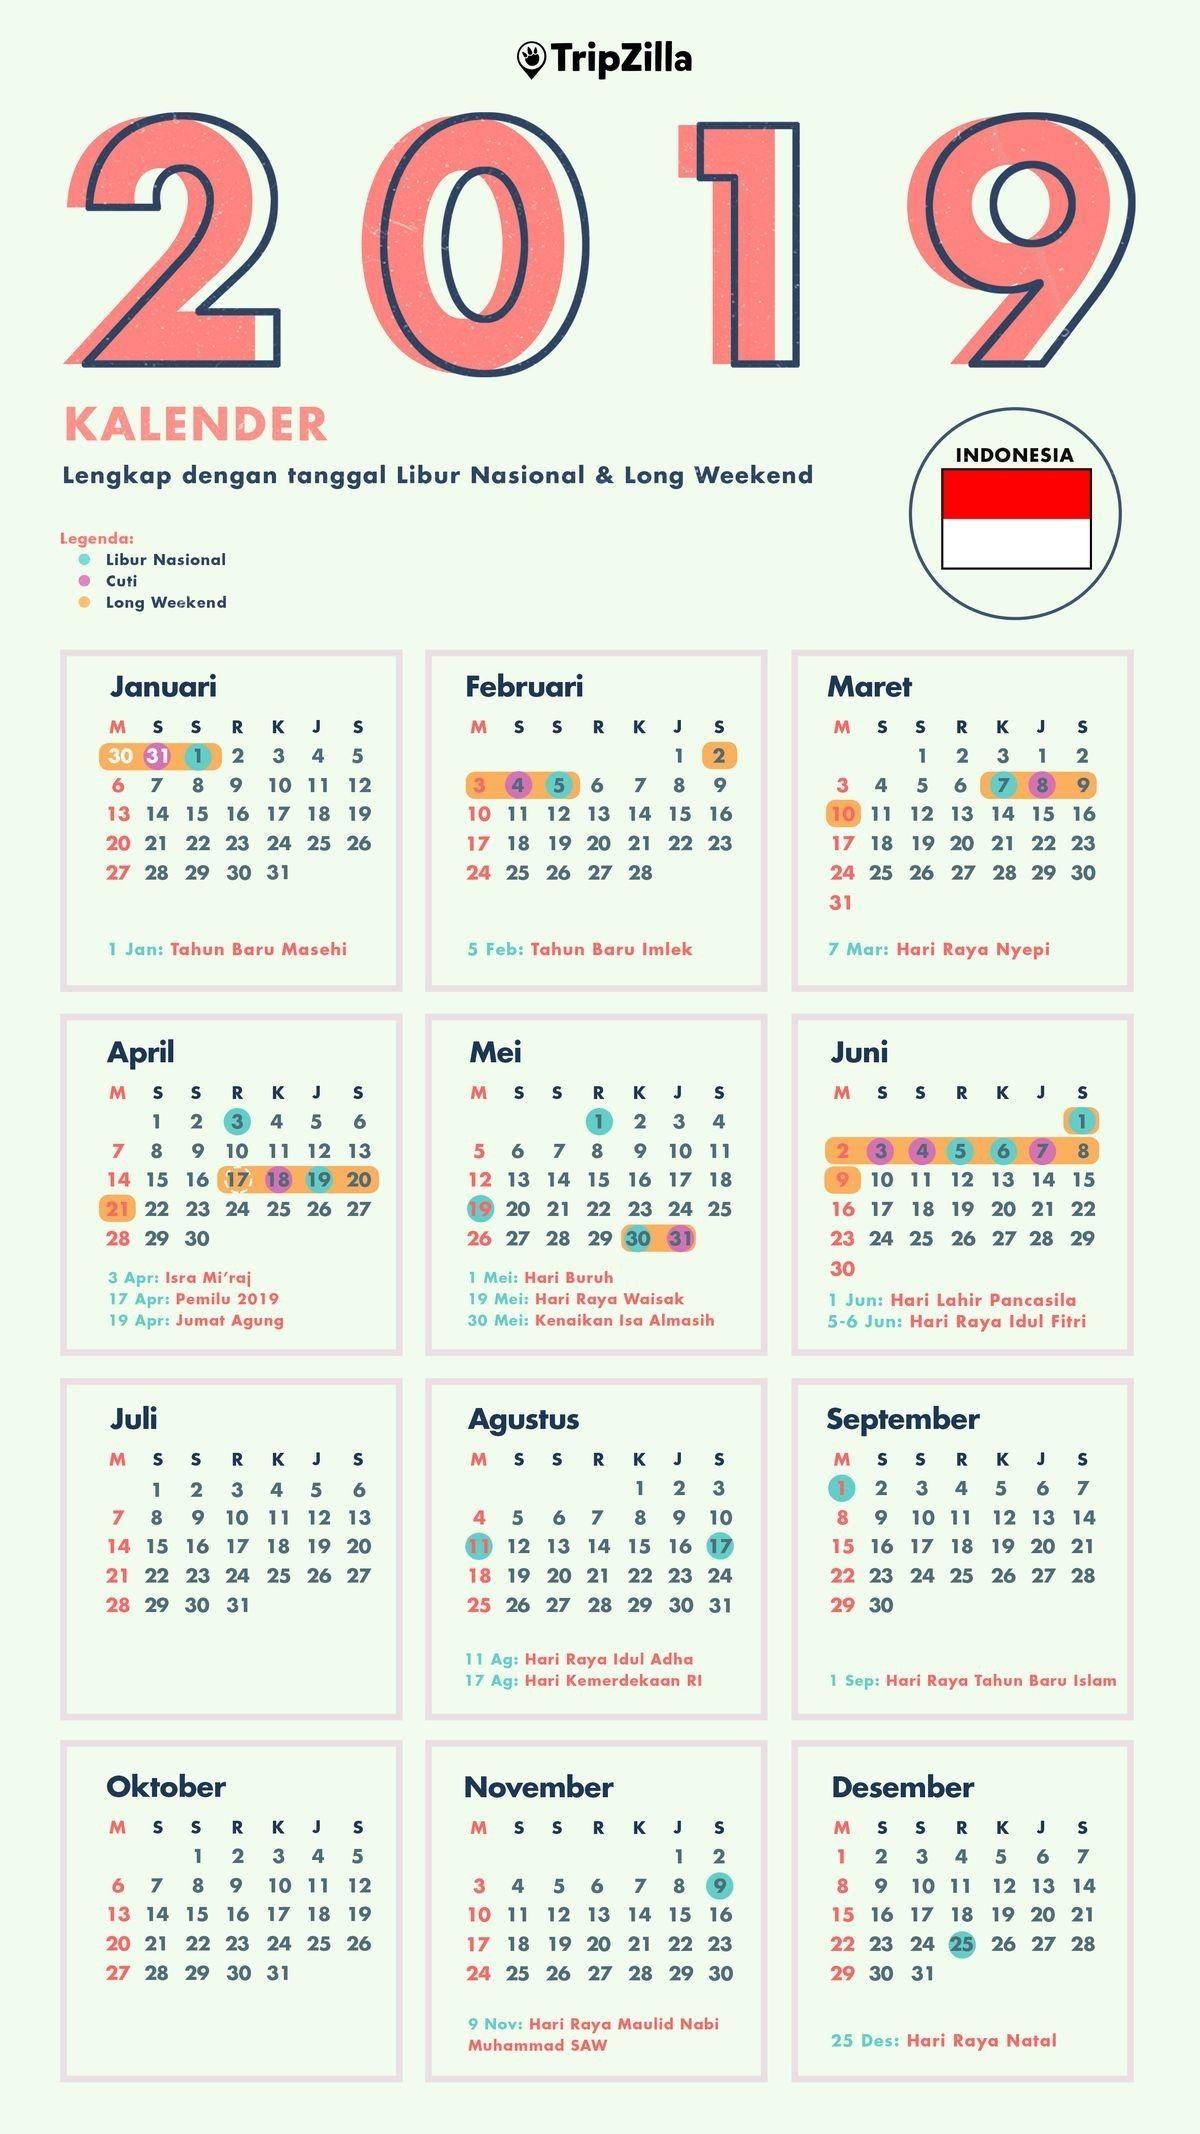 Kalender Kalender Pendidikan Buku Mewarnai